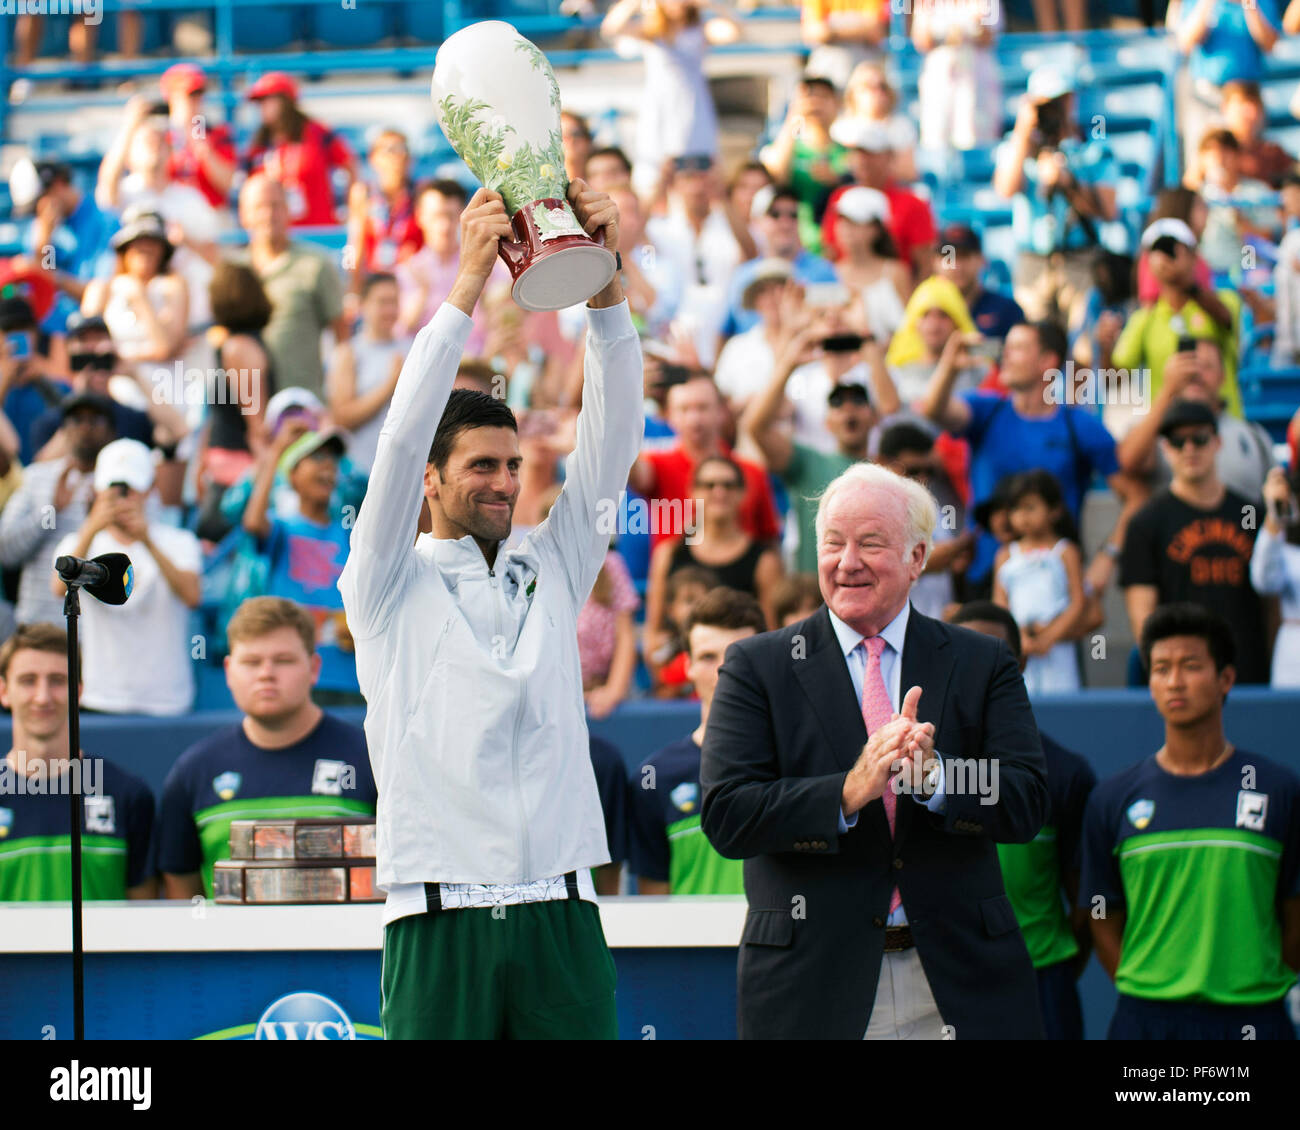 Mason, Ohio, USA. August 19, 2018: Novak Djokovic (SRB) holds aloft the Rookwood Trophy at the Western Southern Open in Mason, Ohio, USA. Brent Clark/Alamy Live News - Stock Image